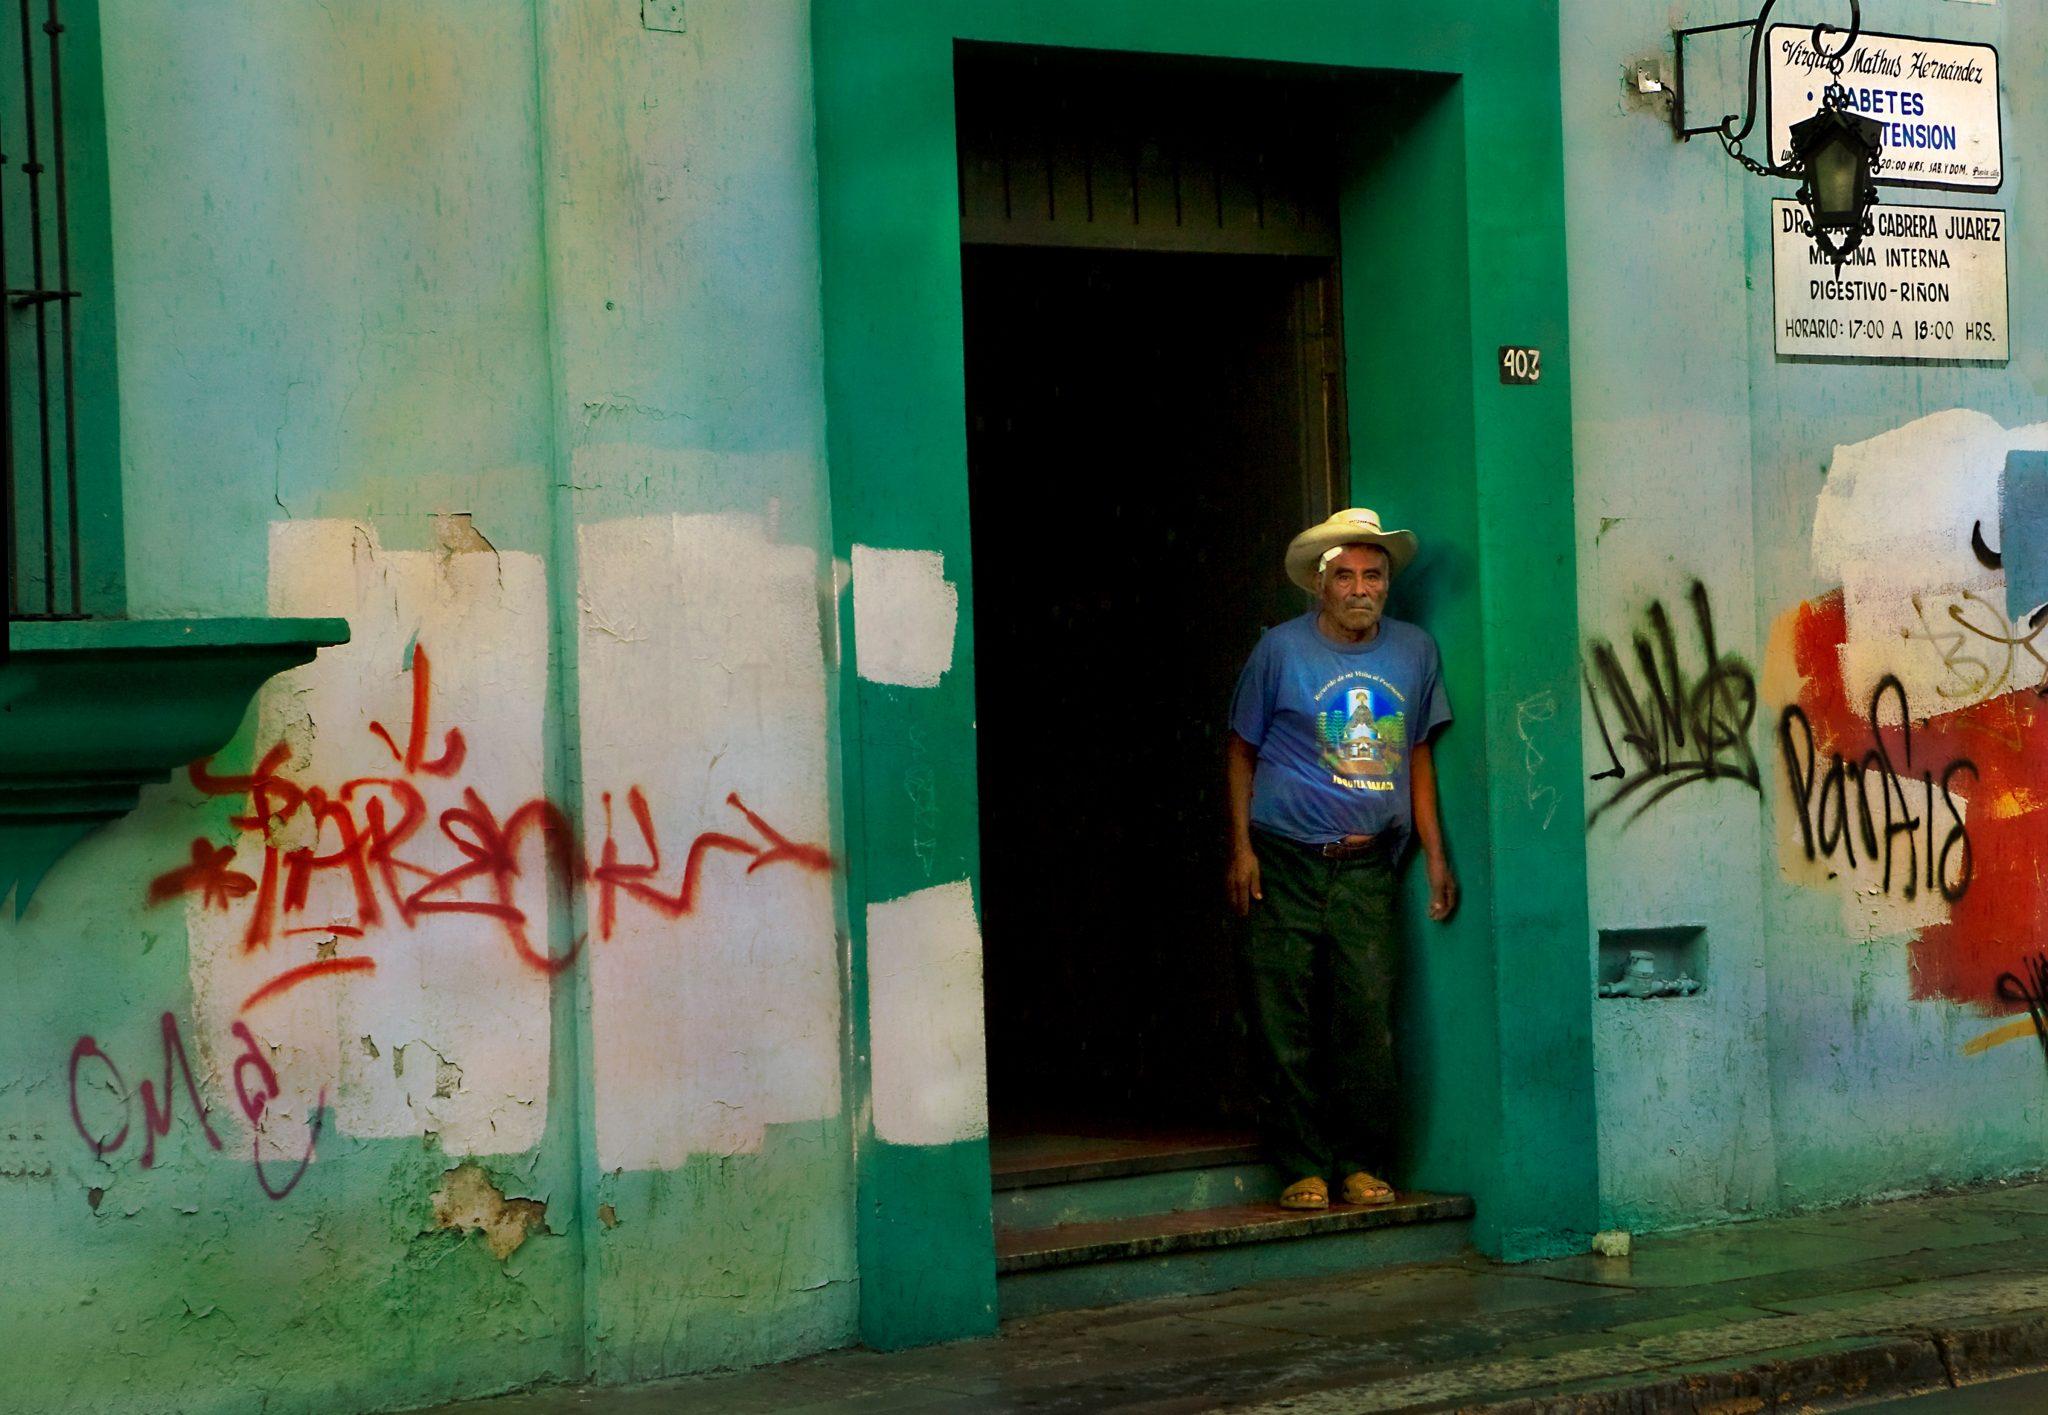 Oaxaca's corn growers return to their farms